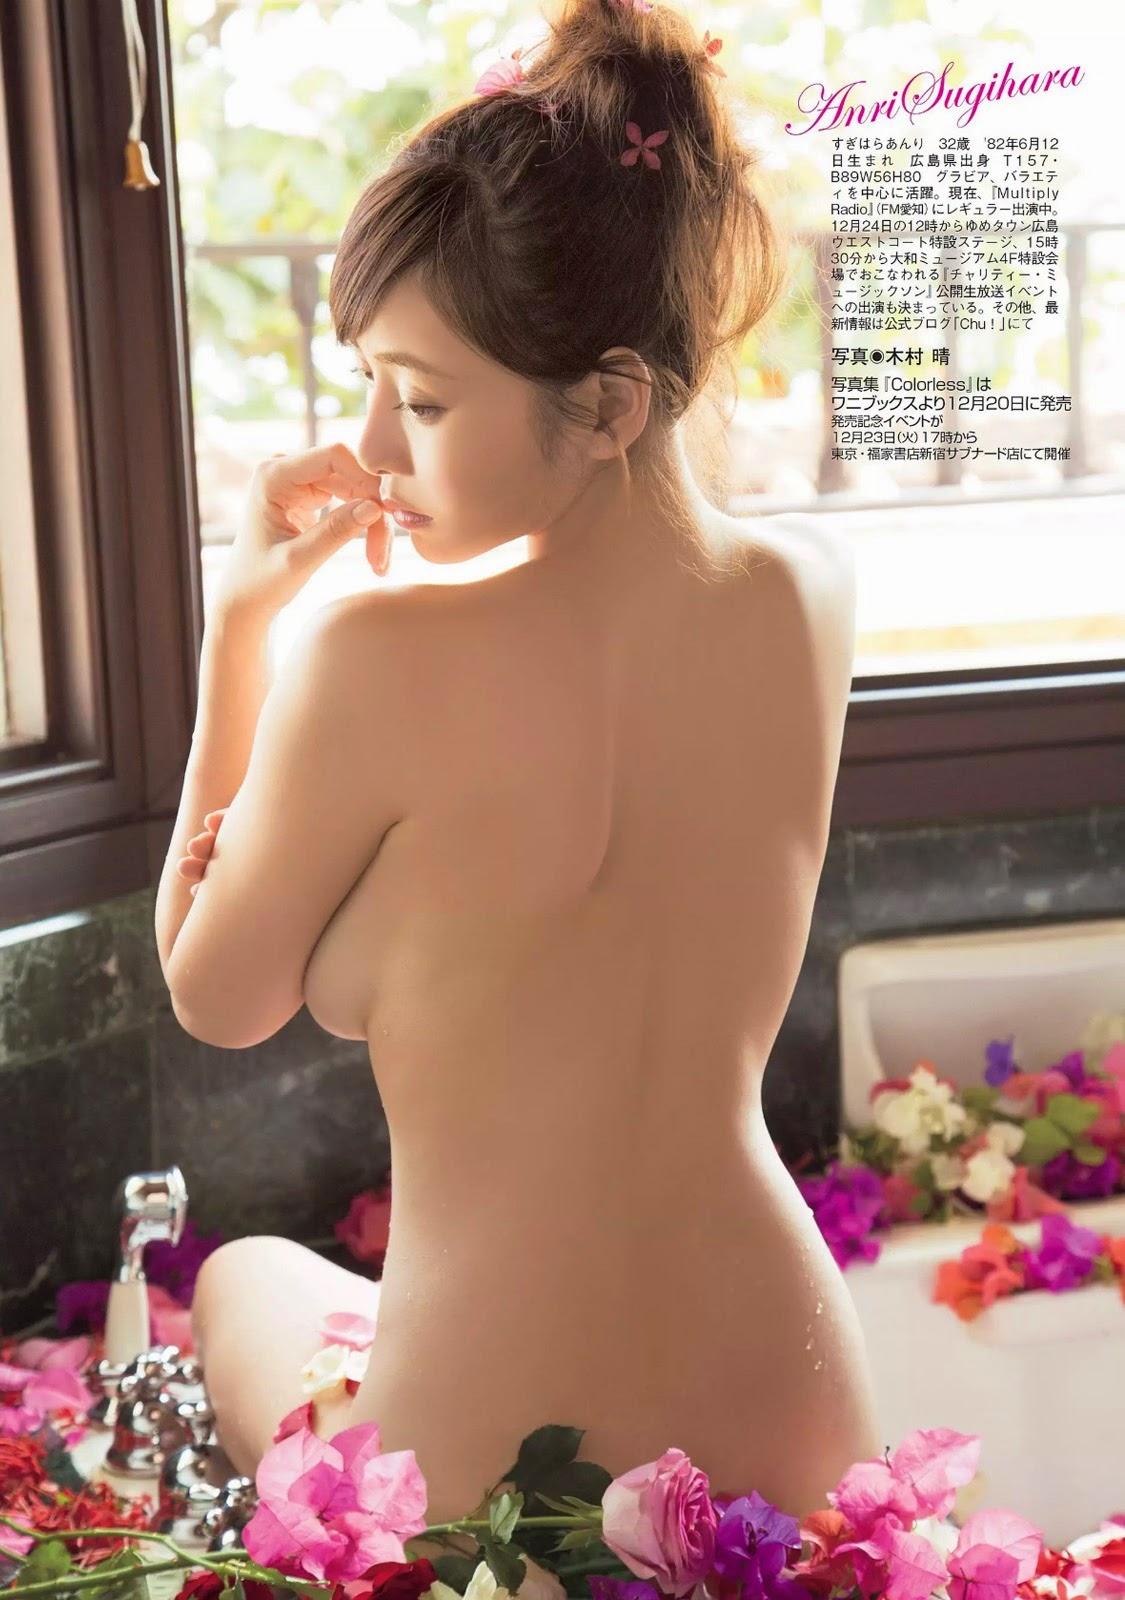 Anri Sugihara 杉原杏璃 Nude Naked Photos 4